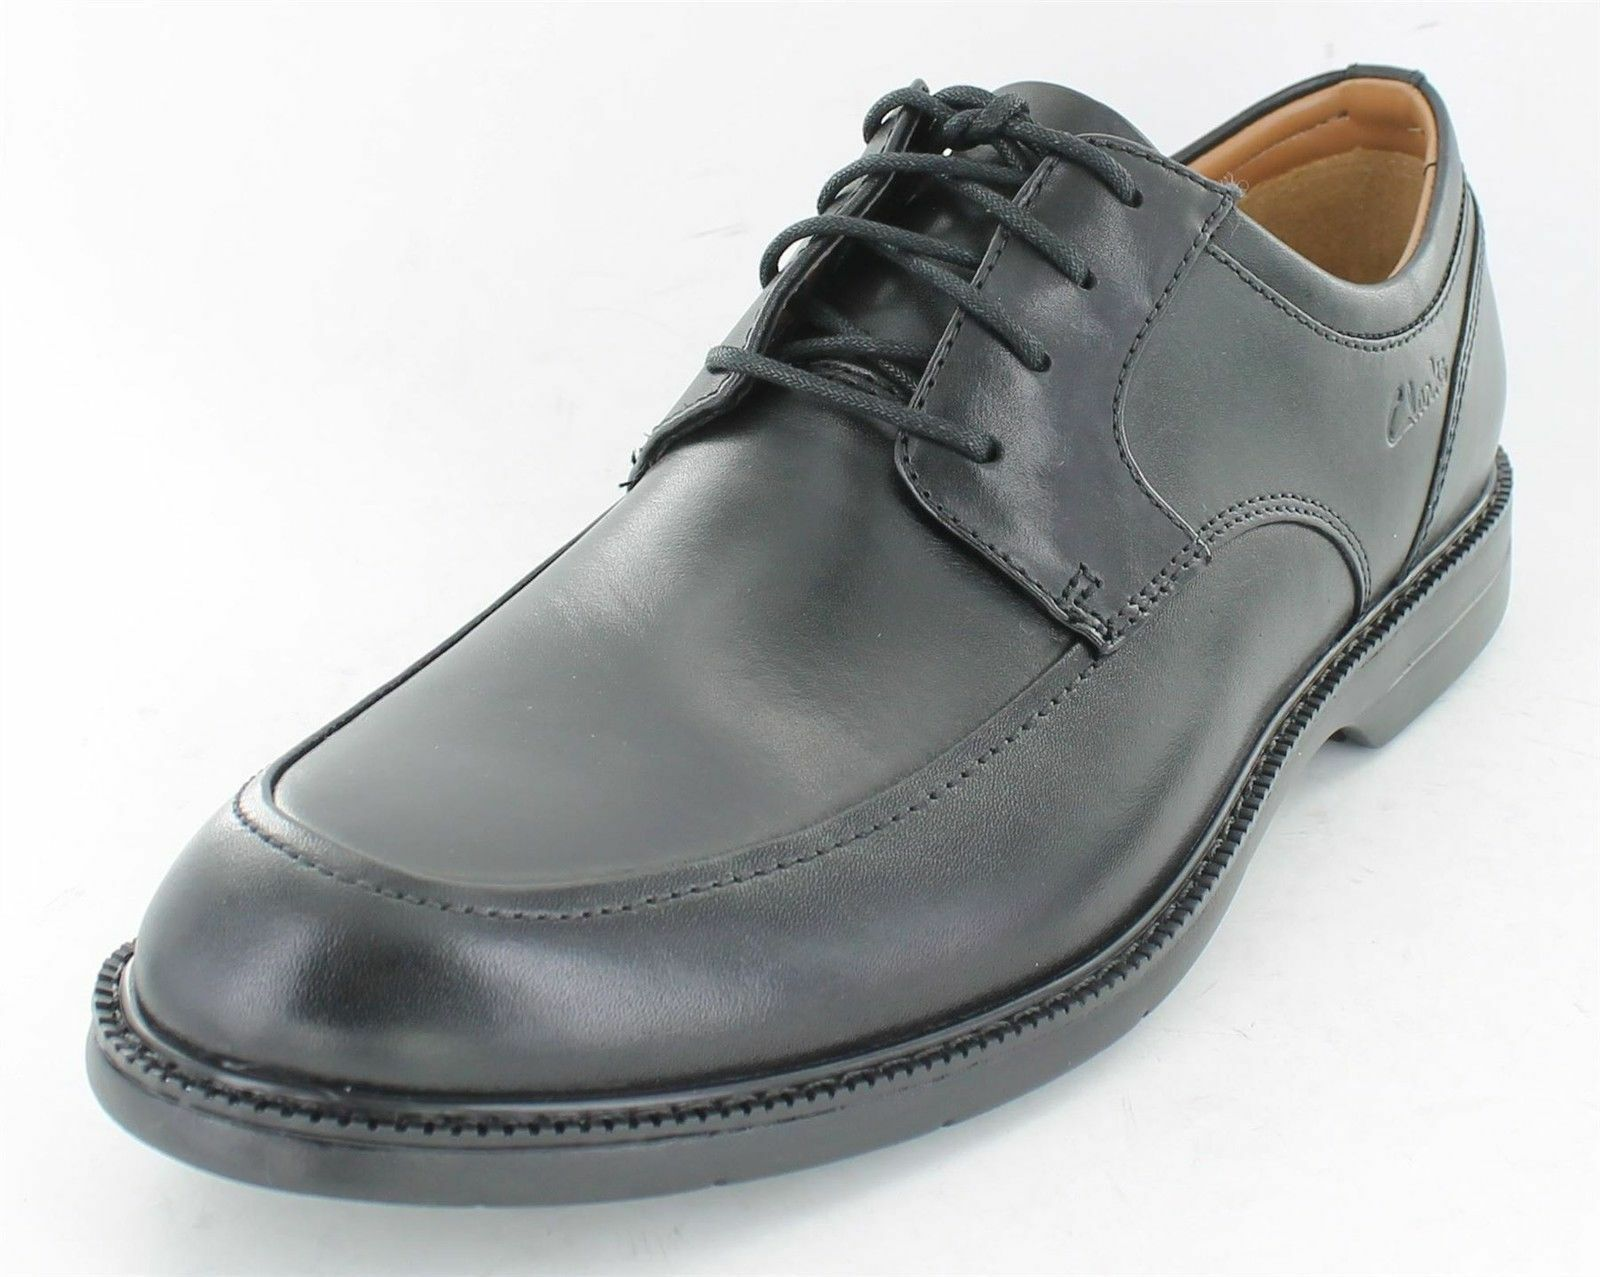 Clarks Bilton geschnürte Walk Herren schwarze geschnürte Bilton Leder förmliche Schuhe 24758d